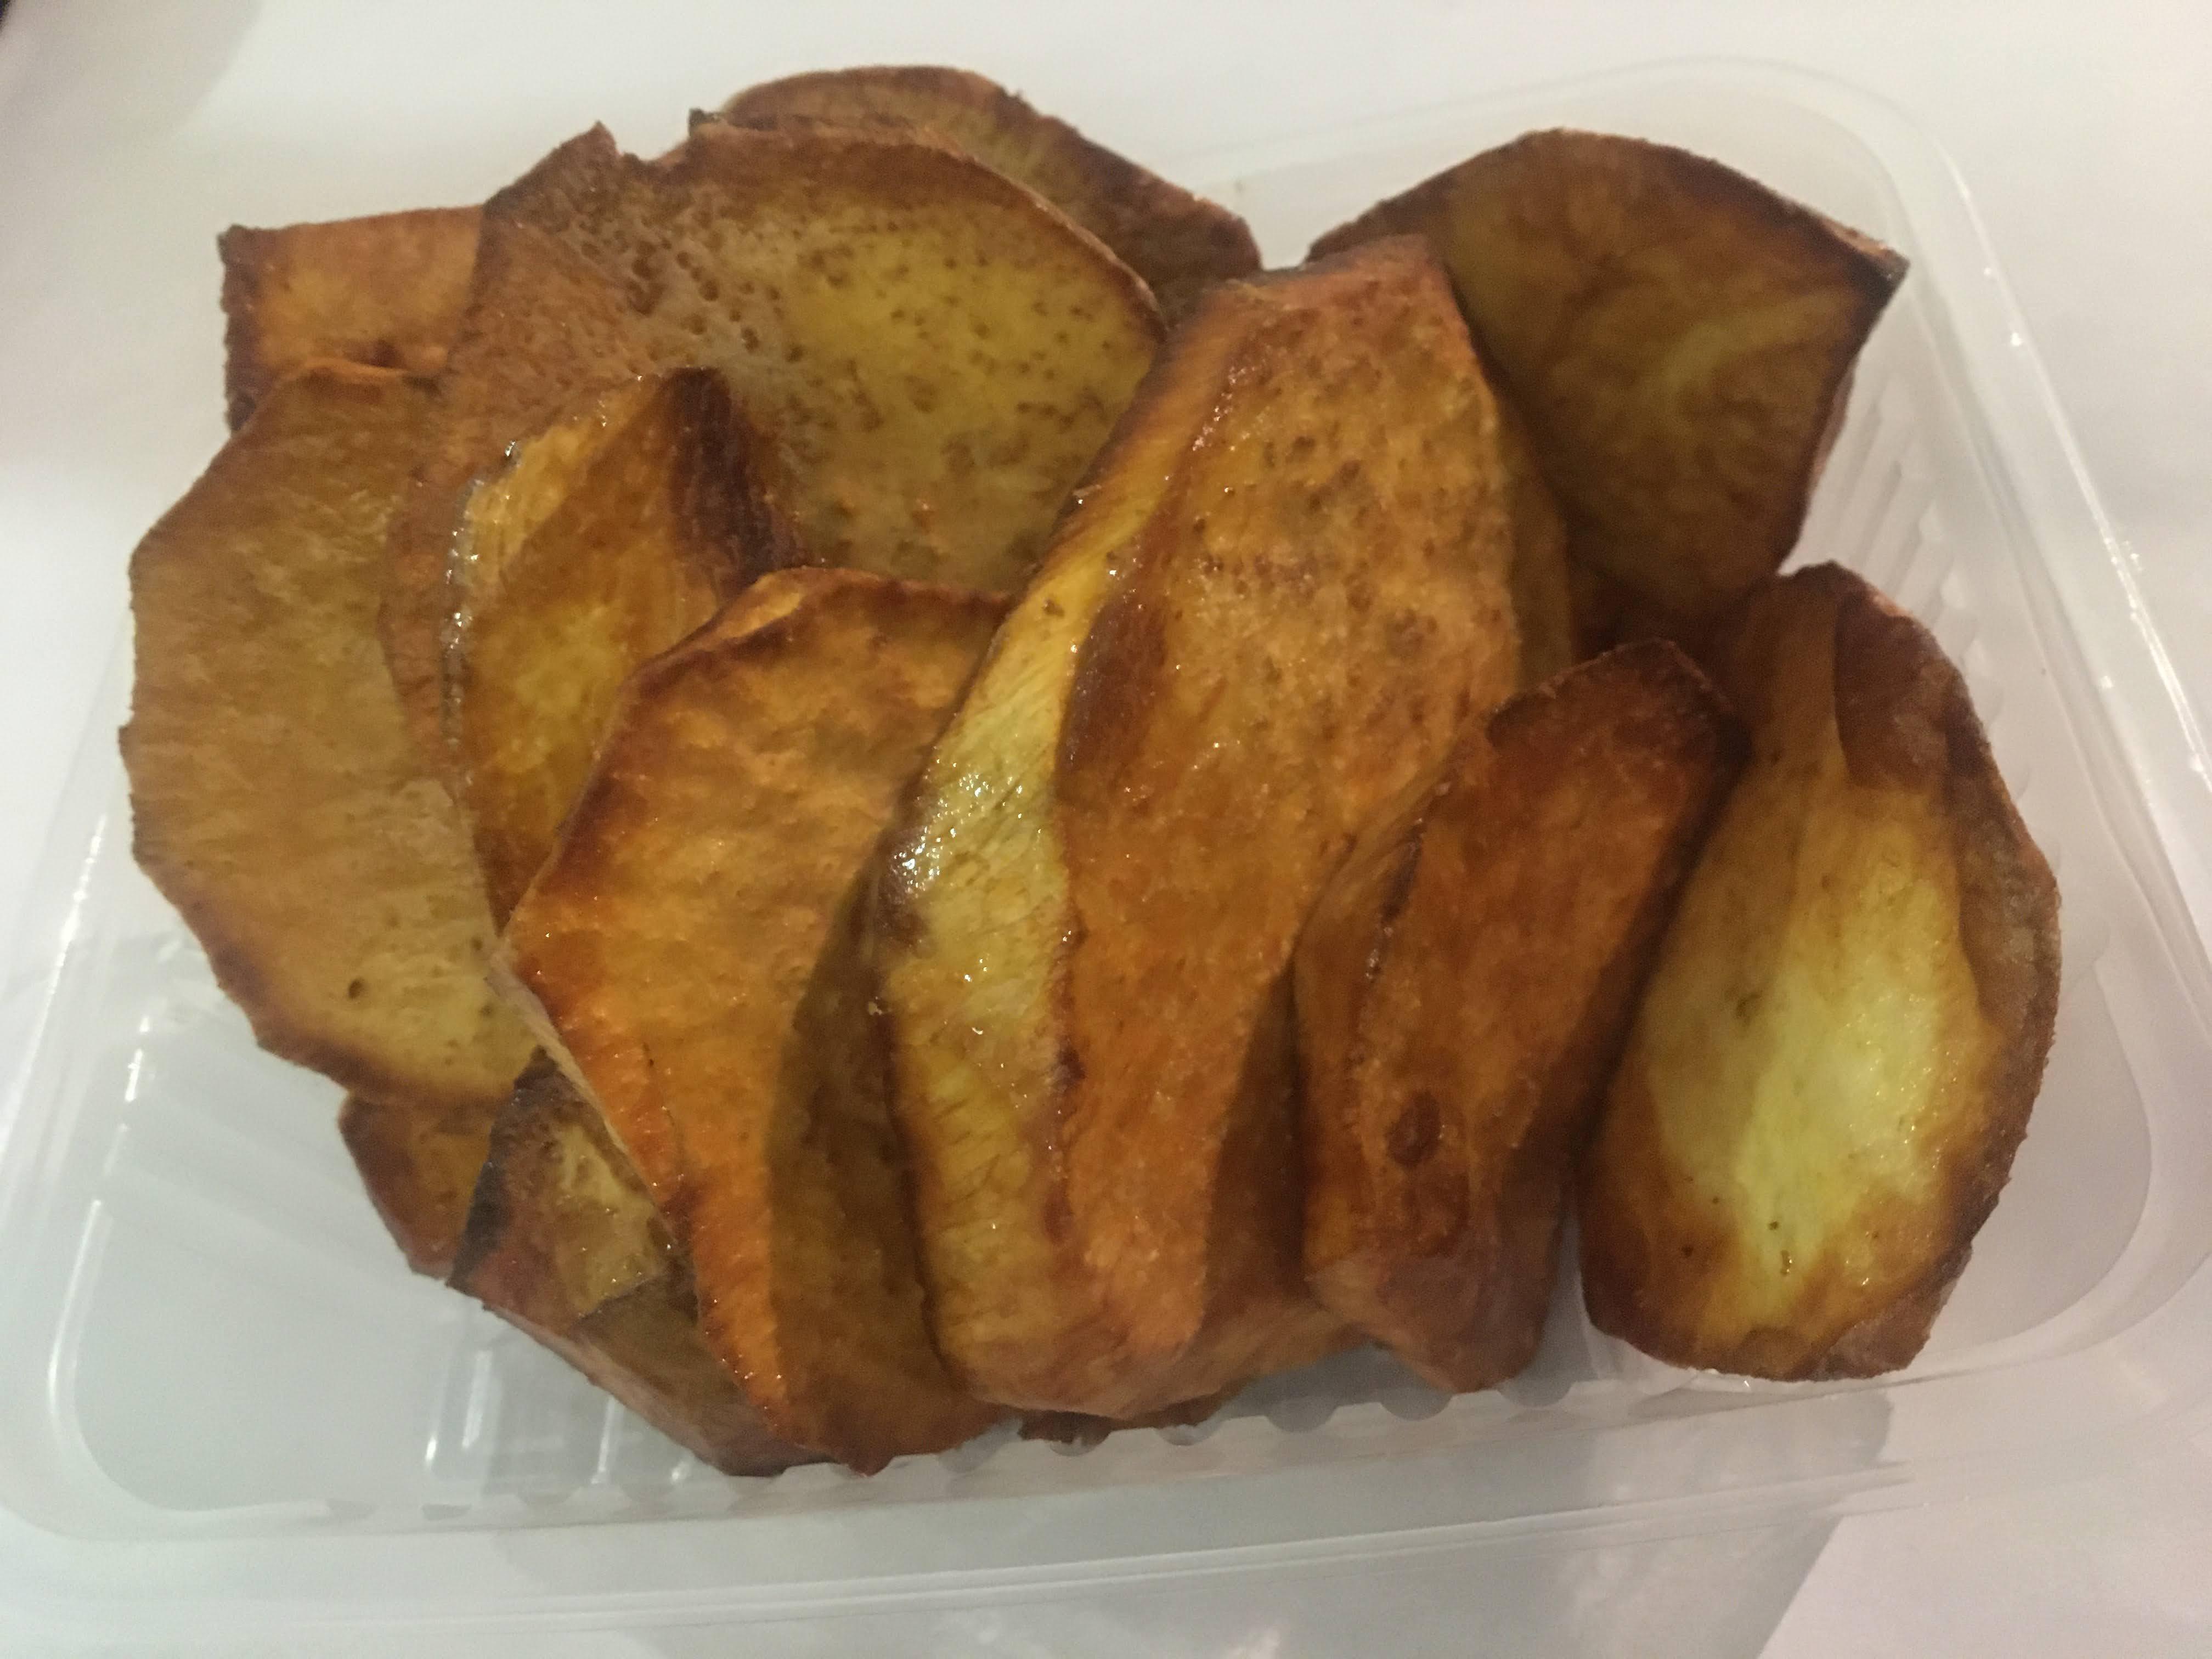 Batata frita o al vapor